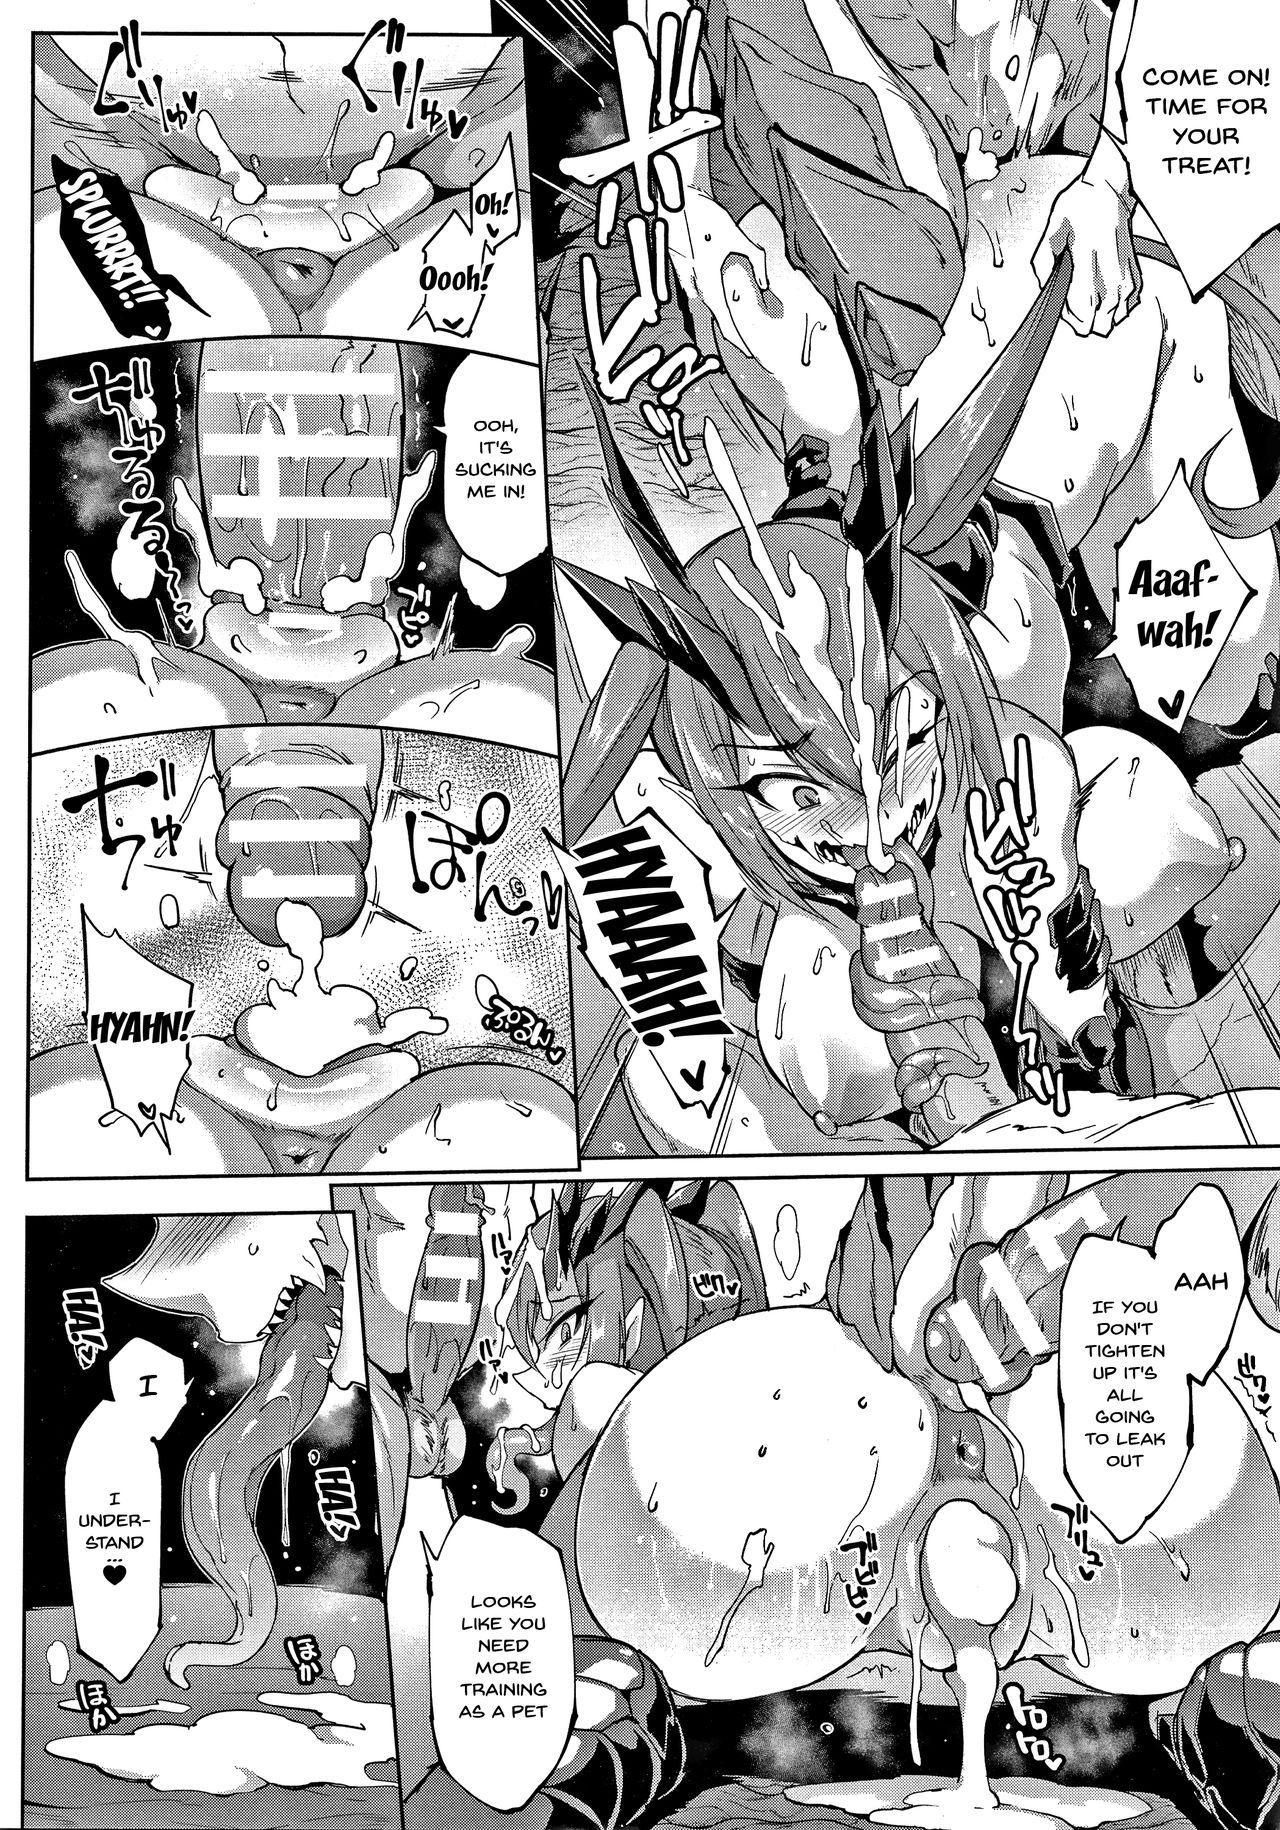 [Fan no Hitori] Sennen Reijou ~My Lady, My Master~  Ch.1-6 [English] {Doujins.com} 114